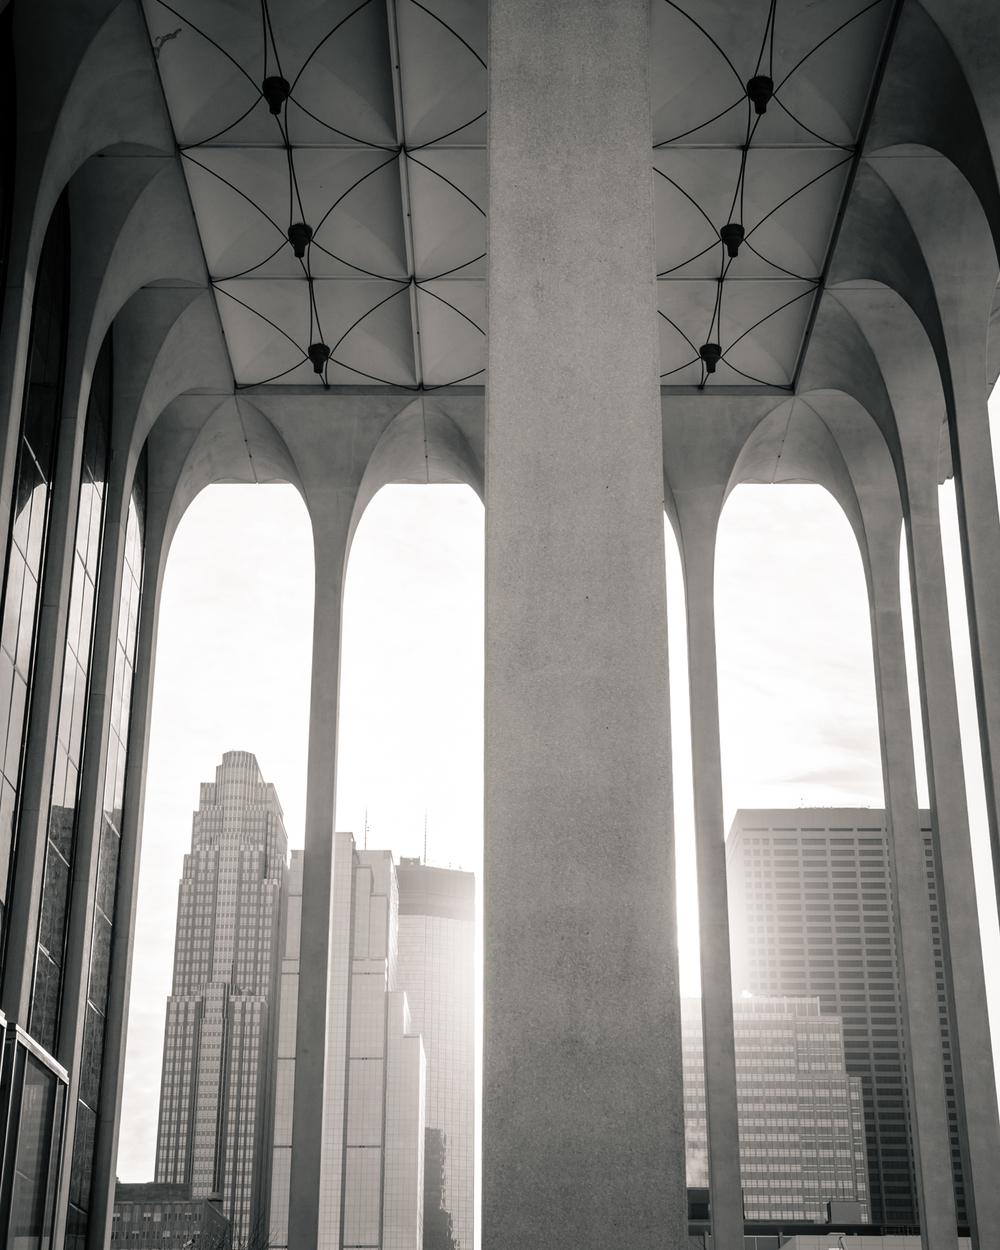 Architecture-Fine-Art-Photography-Jay-Lansford-007.jpg